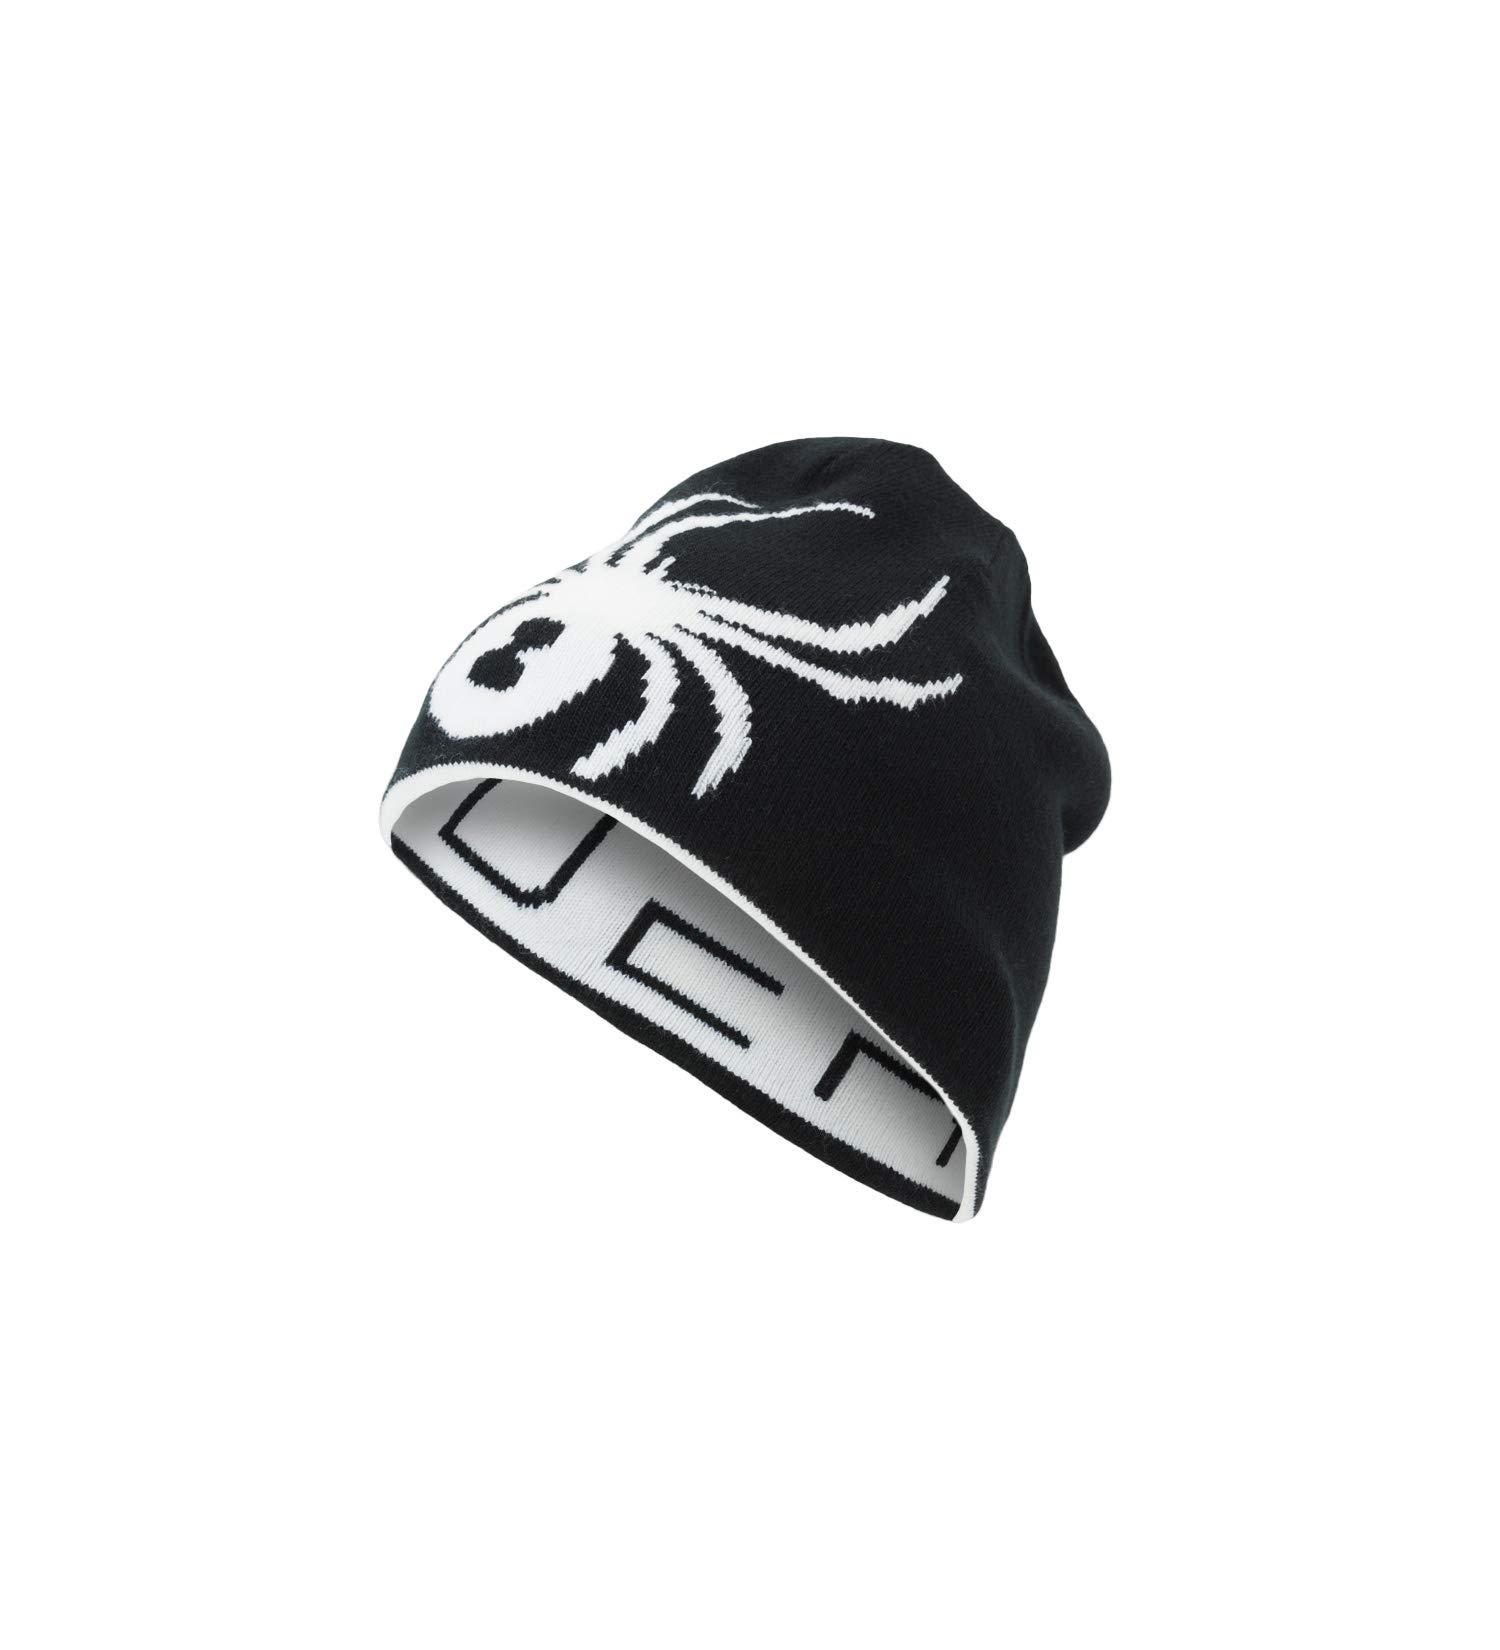 Spyder Boys' Reversible Bug Hat, Black/White, One Size